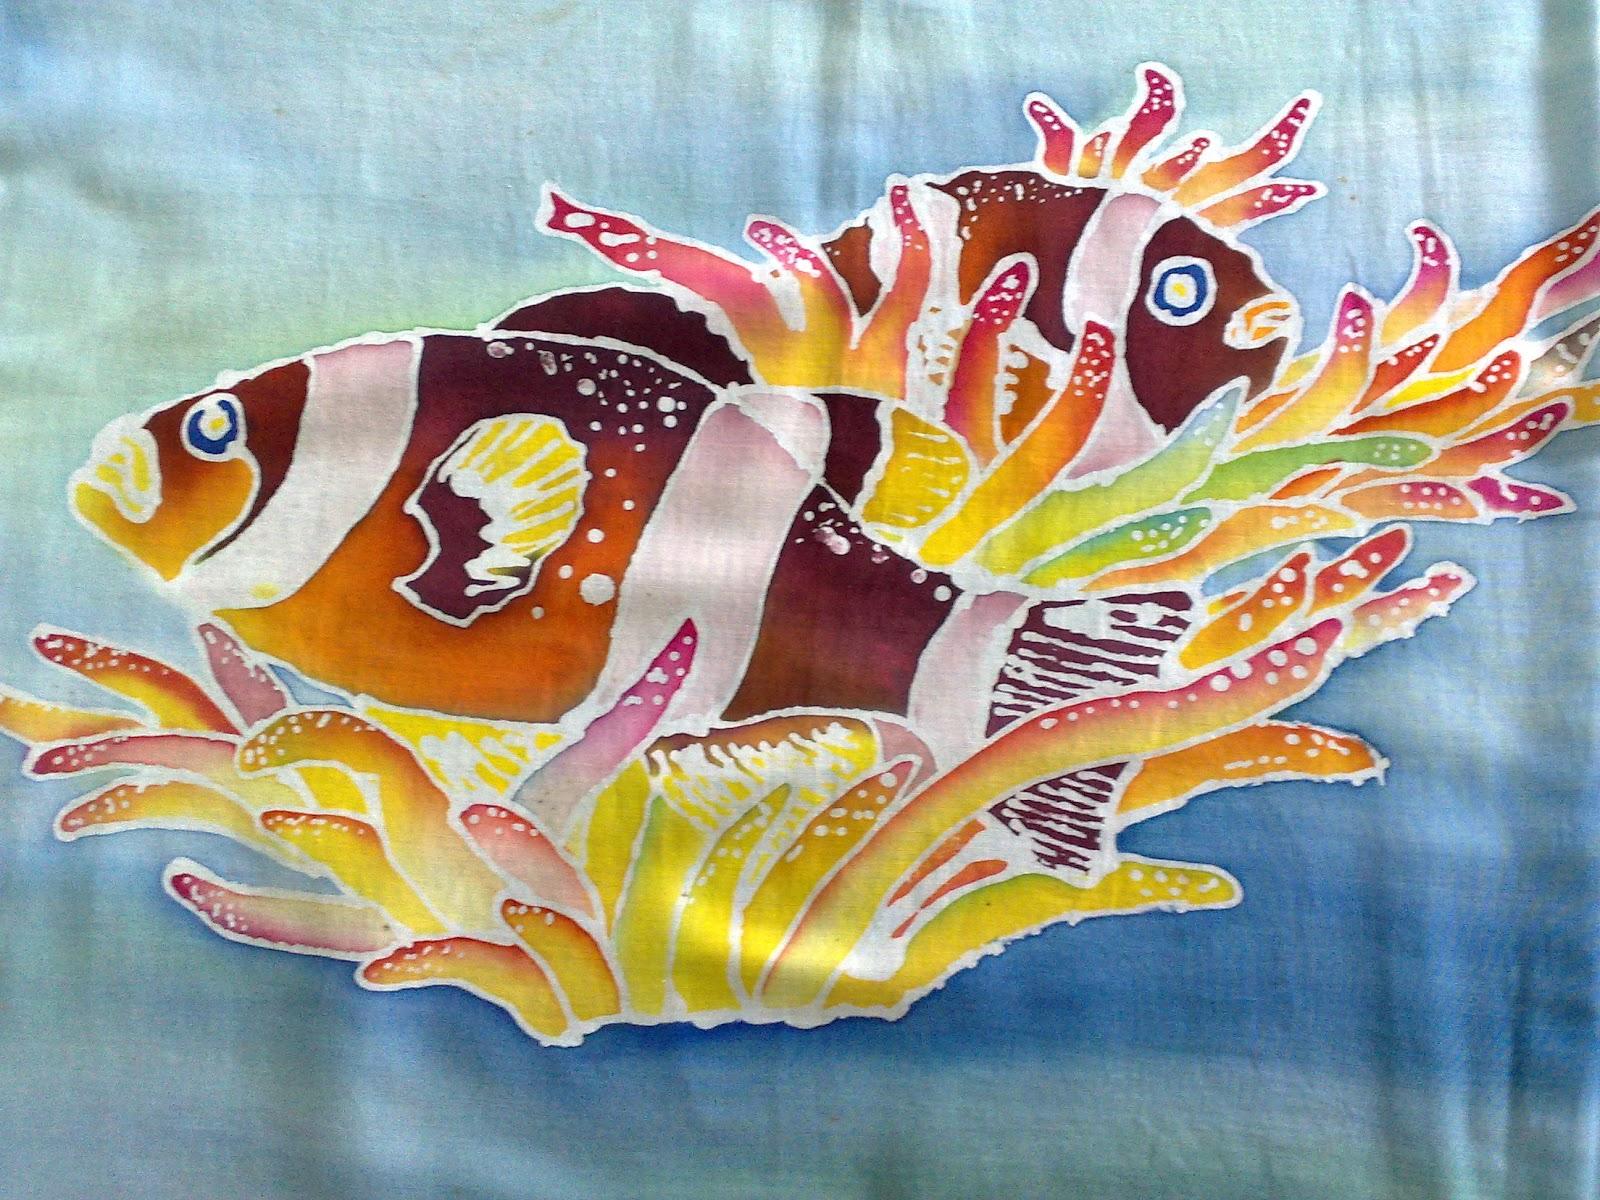 Dawn in Phuket: Phuket Batik - Clothes and Textiles